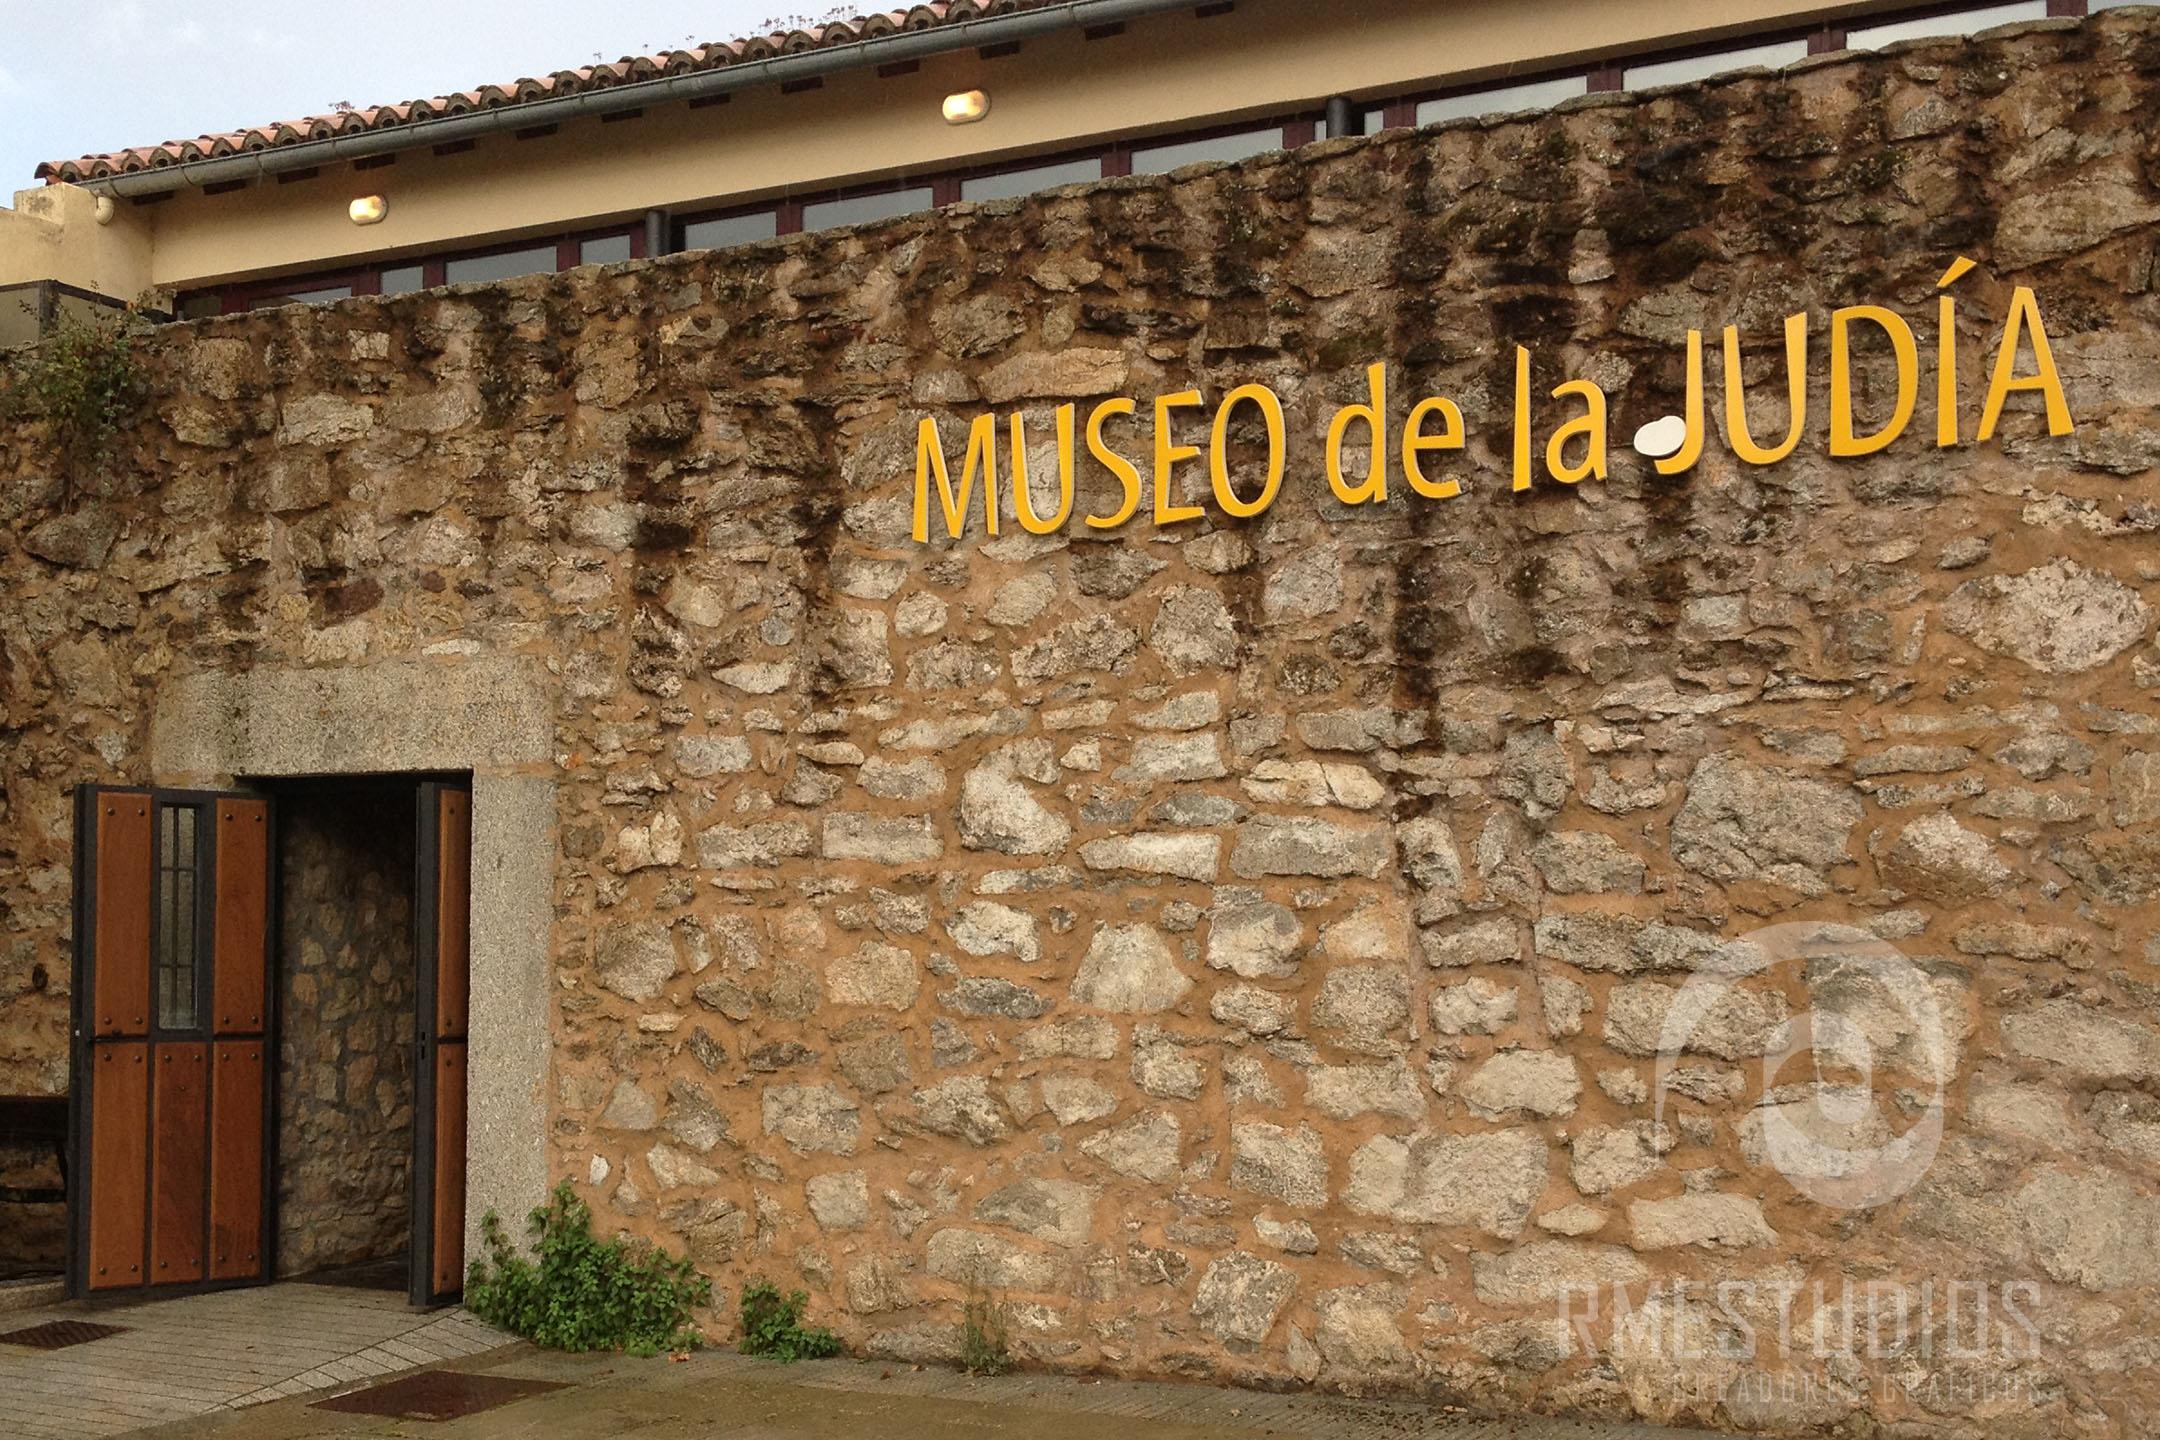 23-rotulo-corporeo-museo-de-la-judia